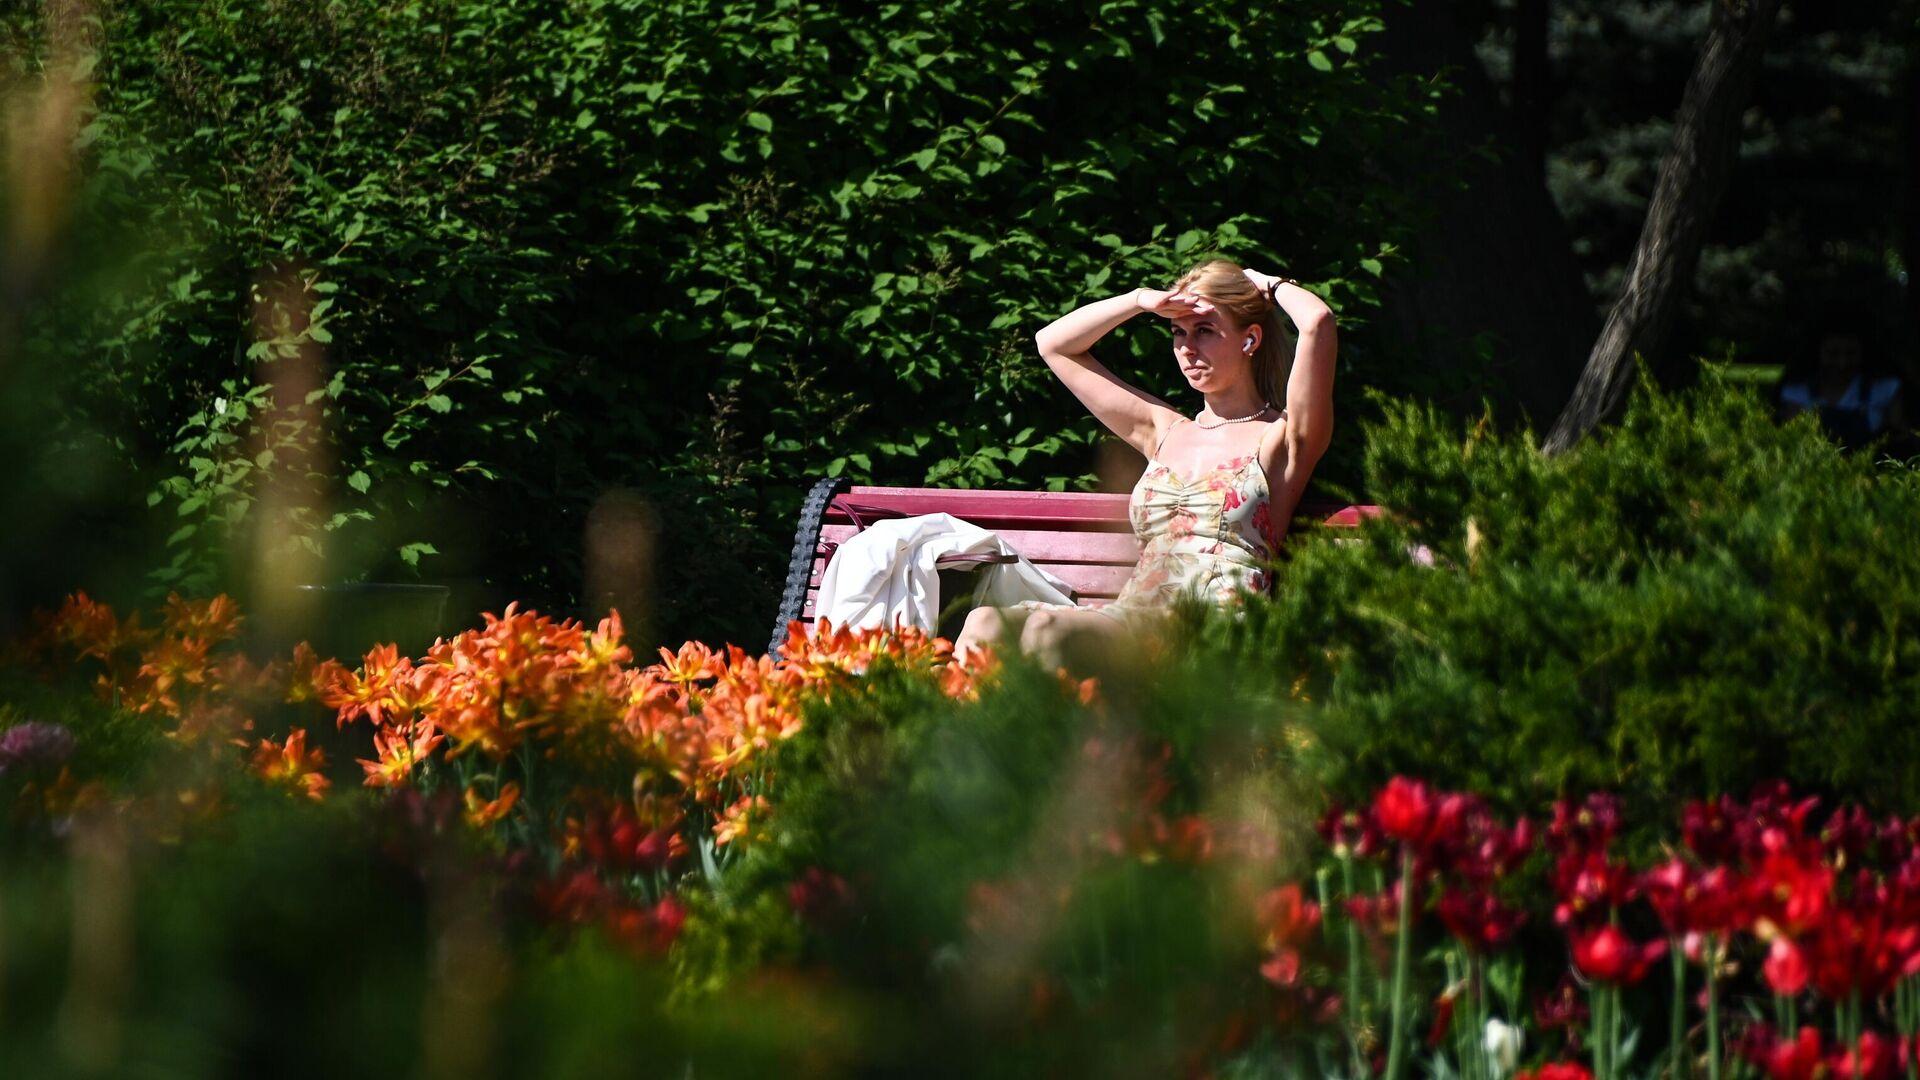 Девушка отдыхает под солнцем на скамейке в парке  - РИА Новости, 1920, 27.06.2021